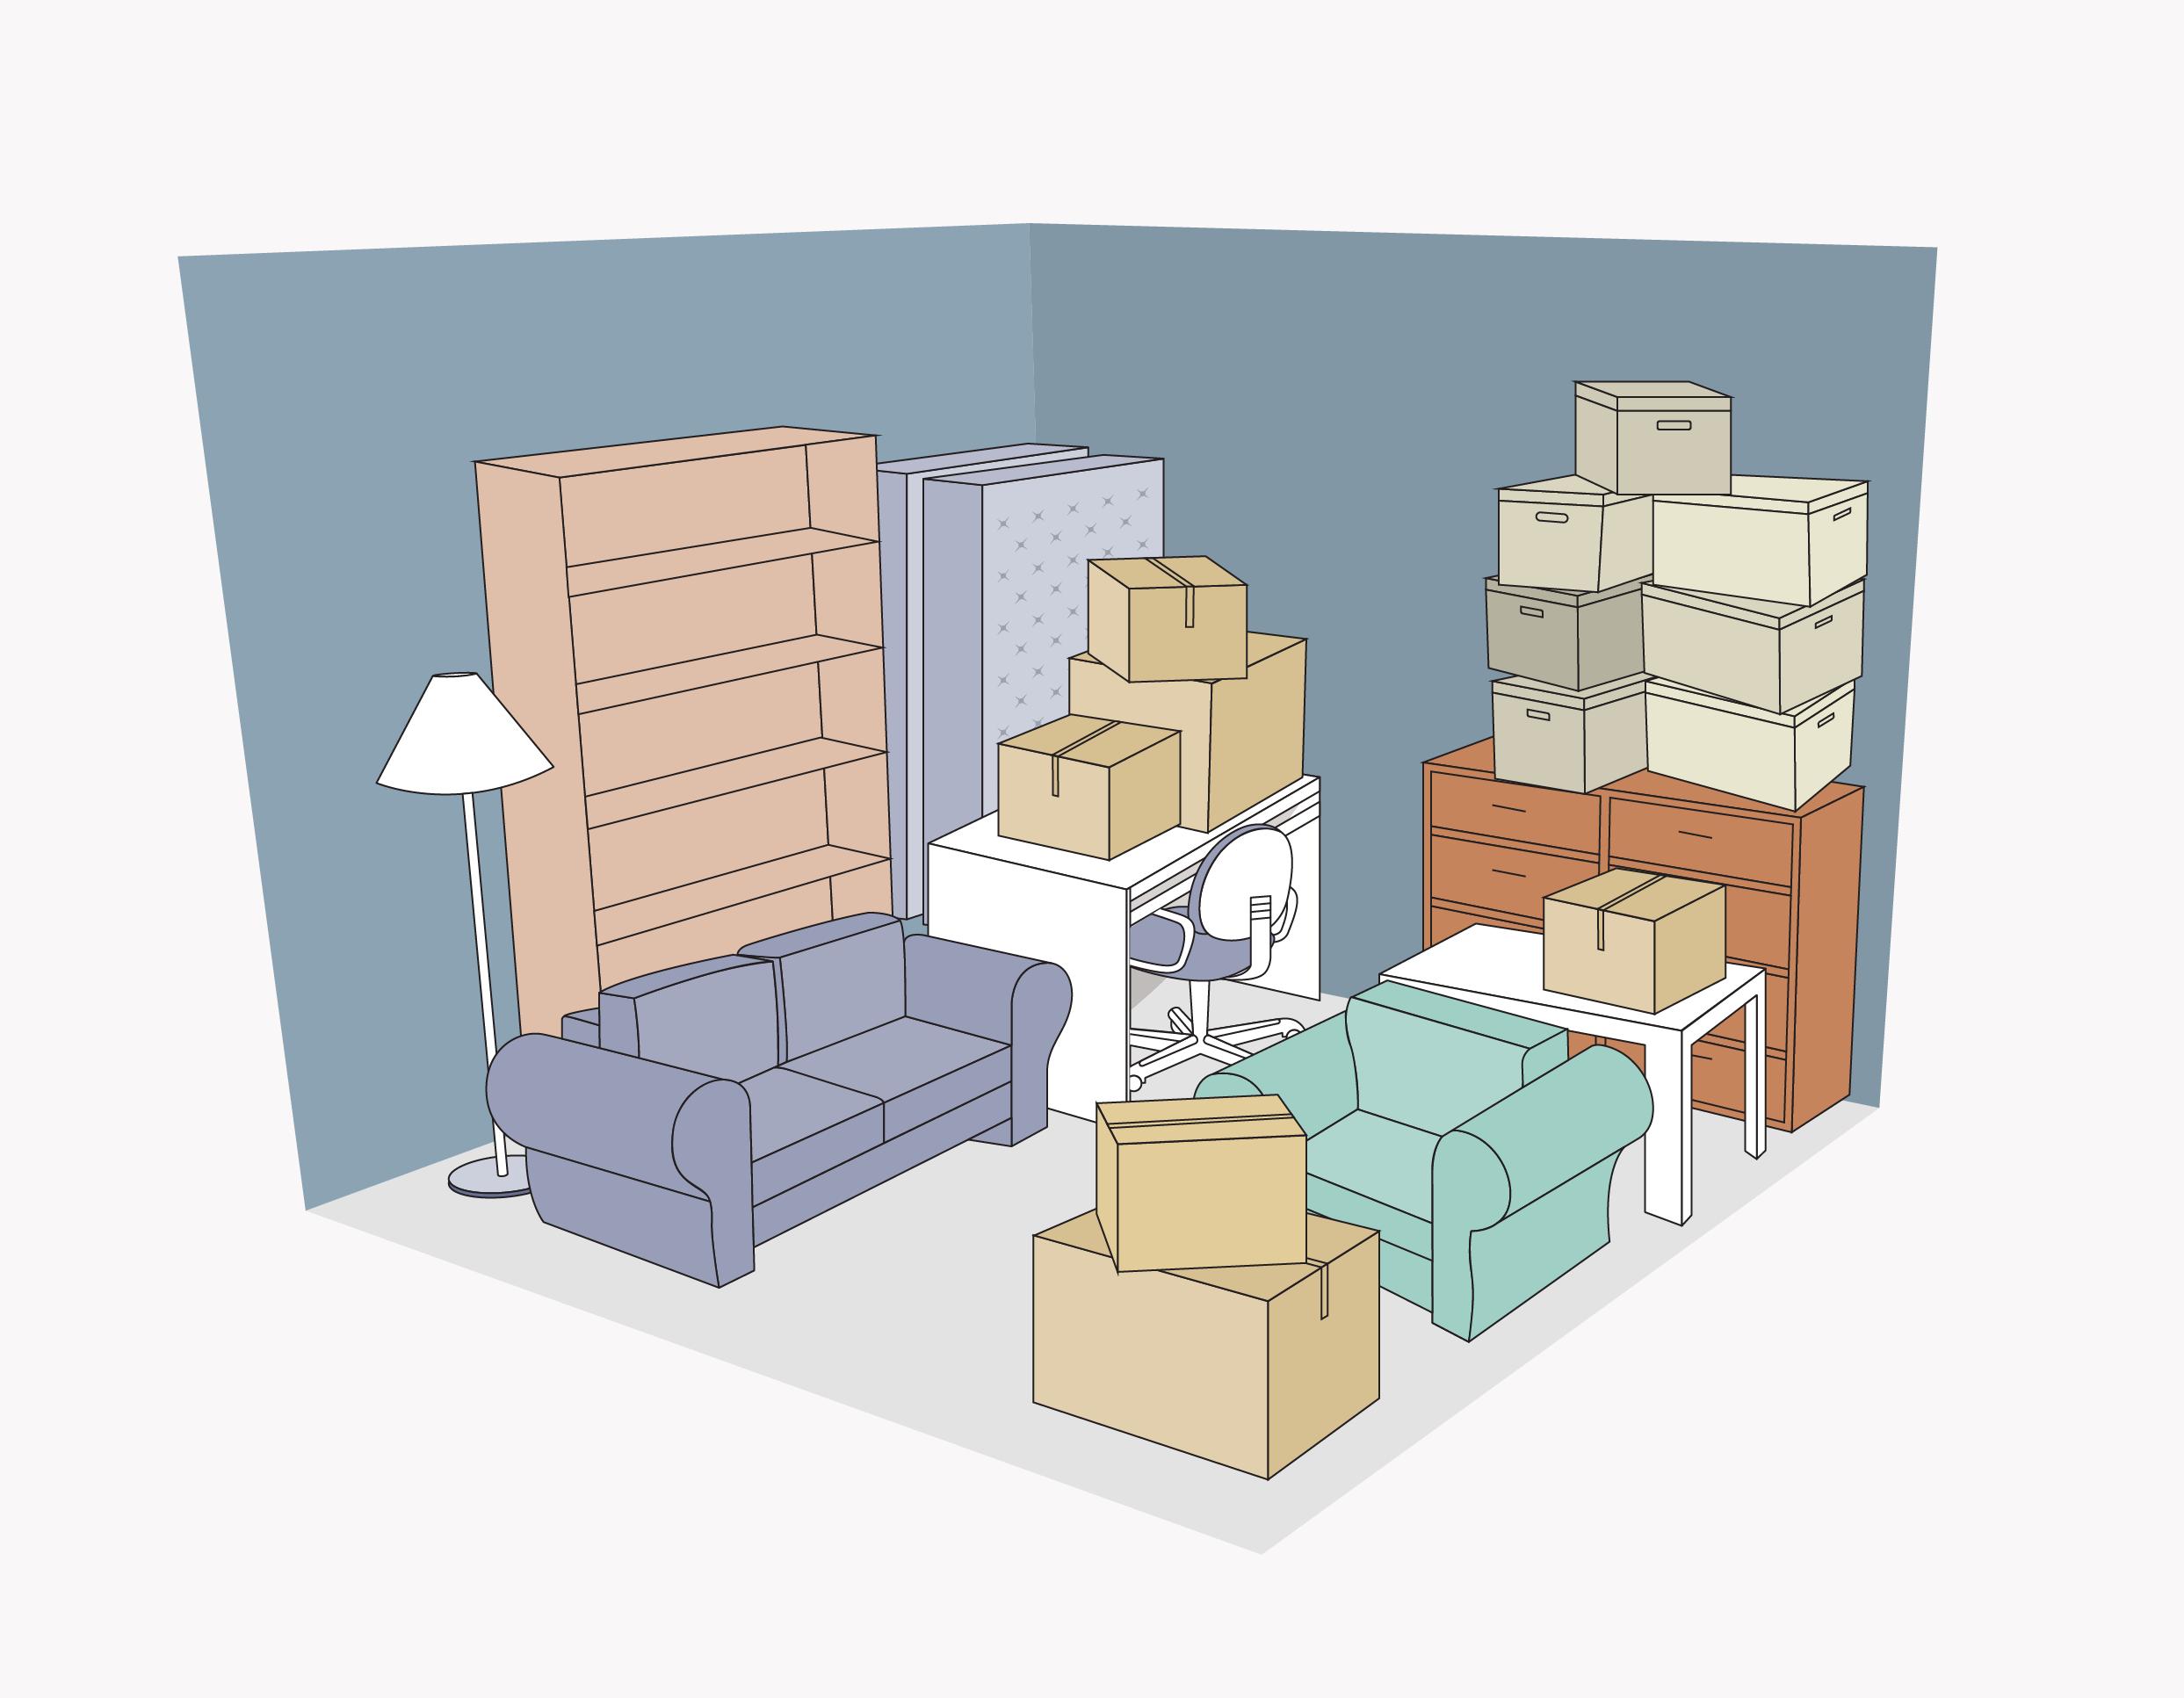 Mini Storage - 10x10